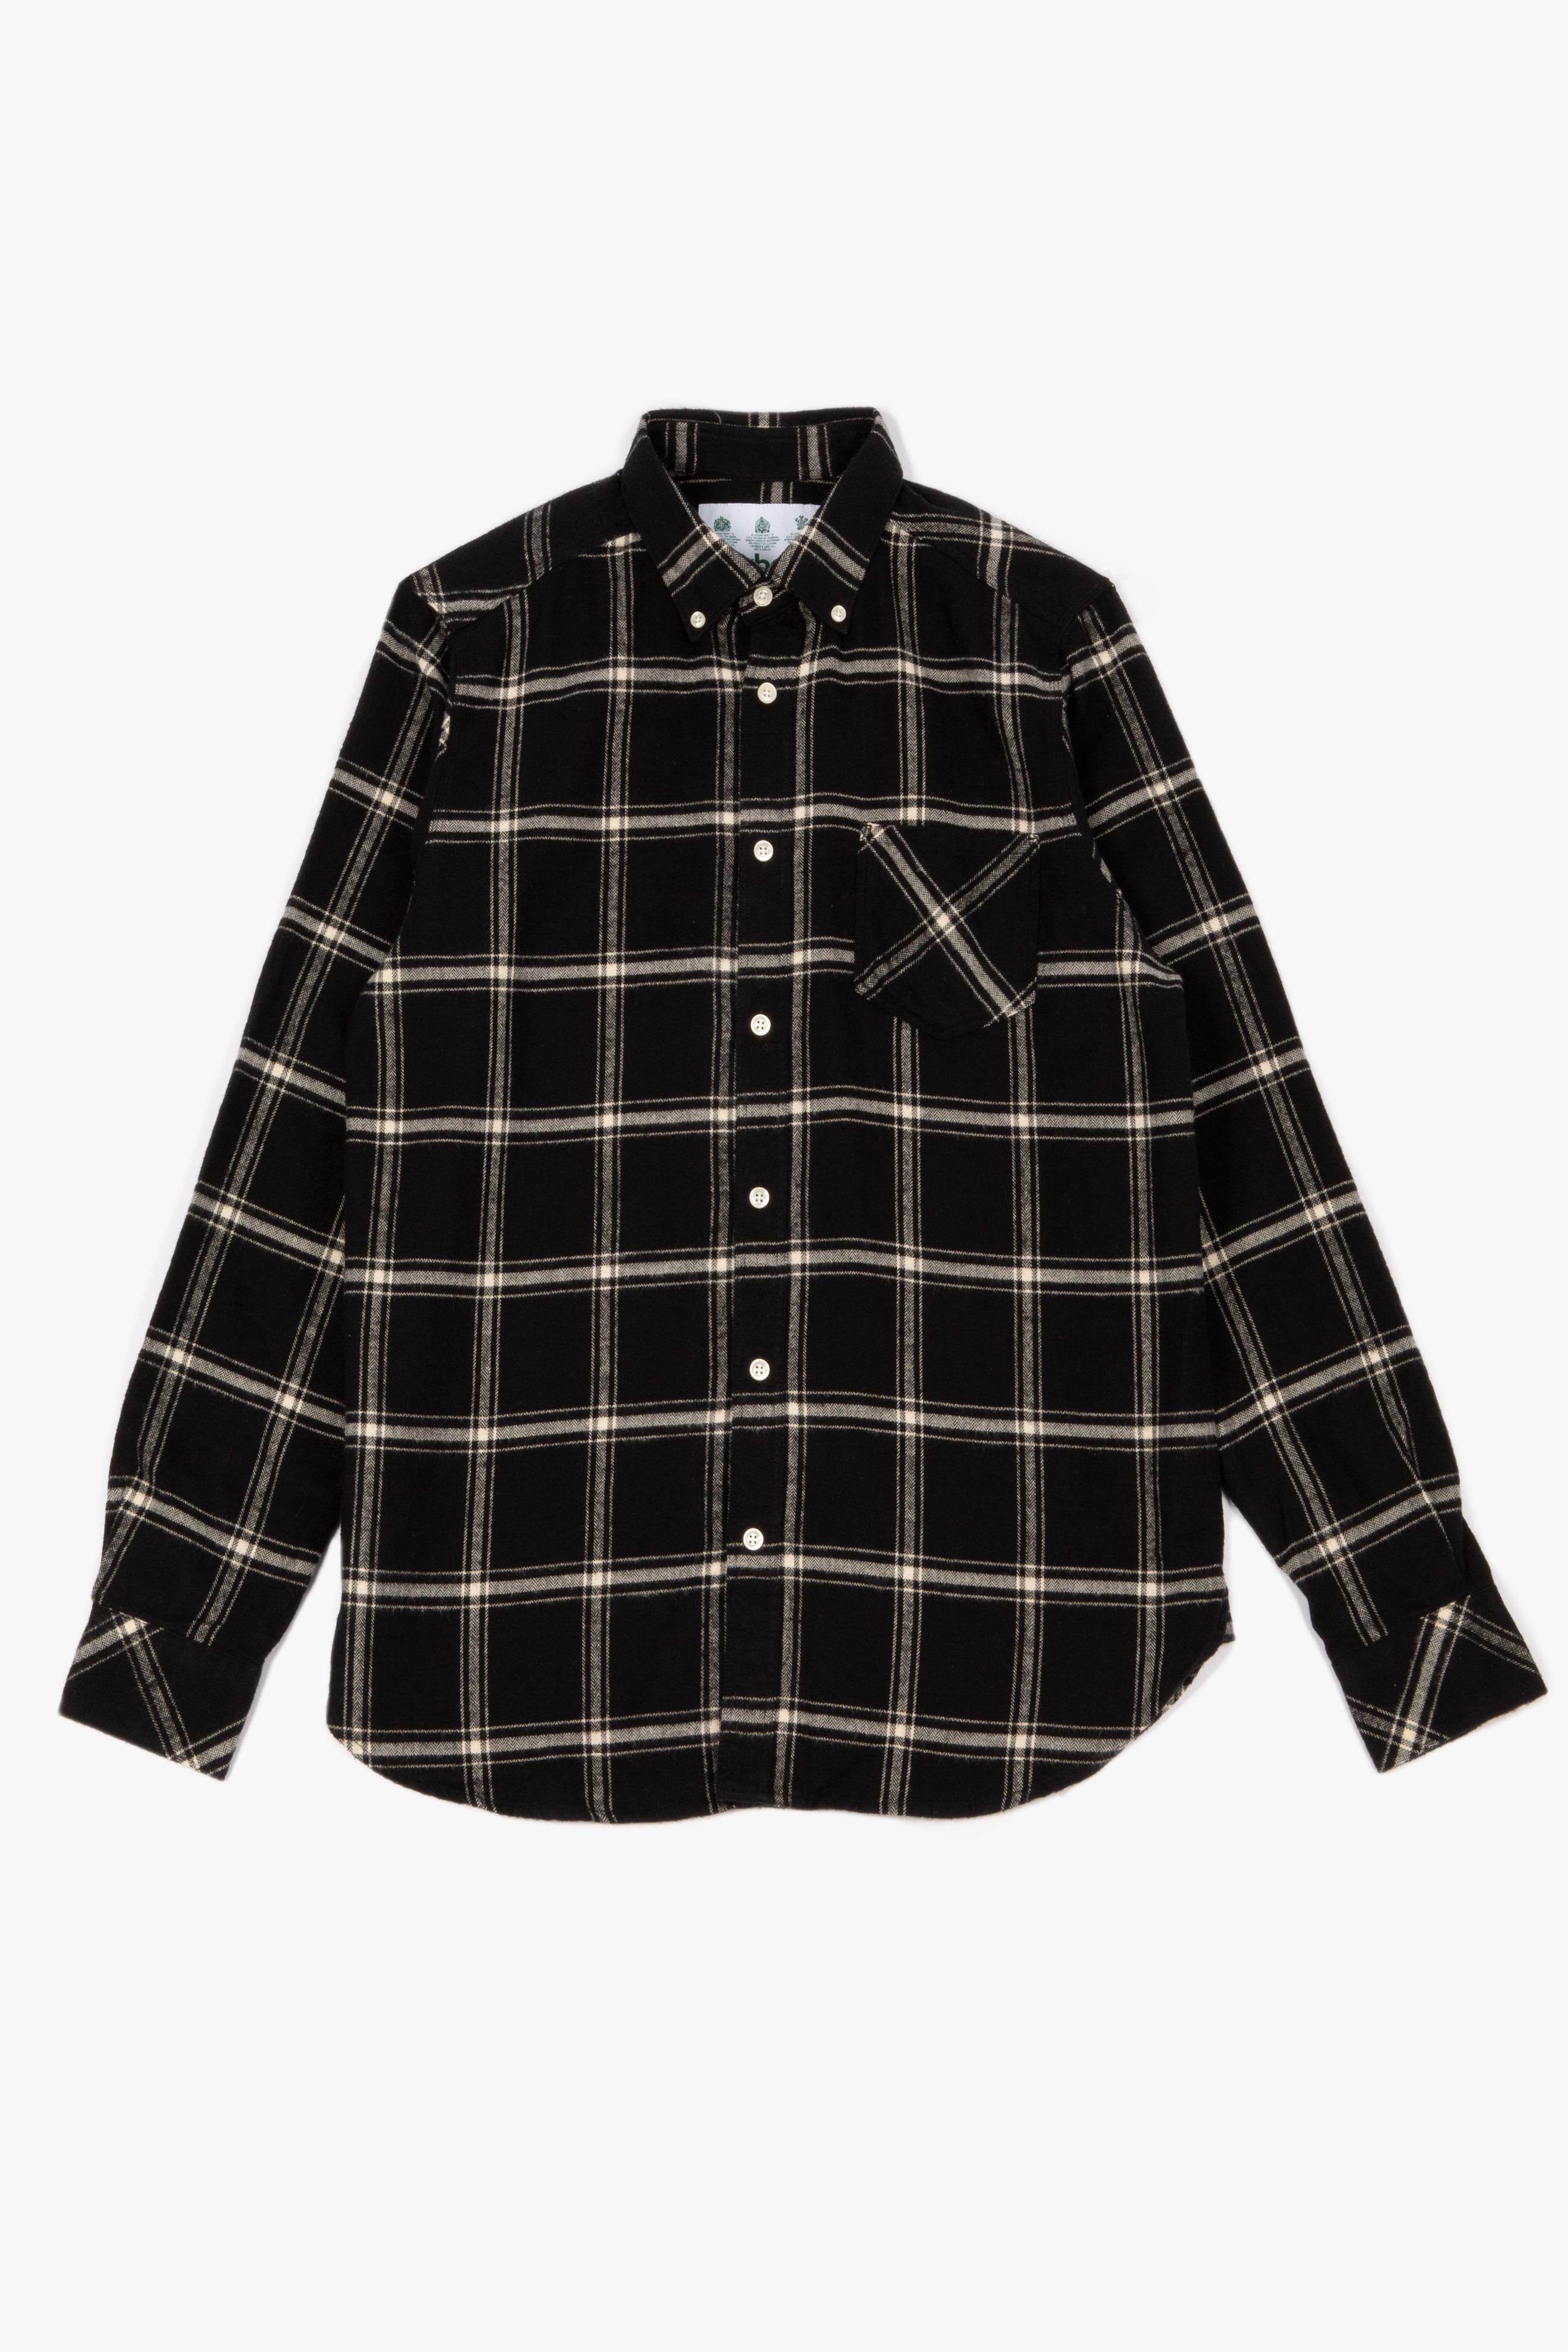 Raven Shirt Black